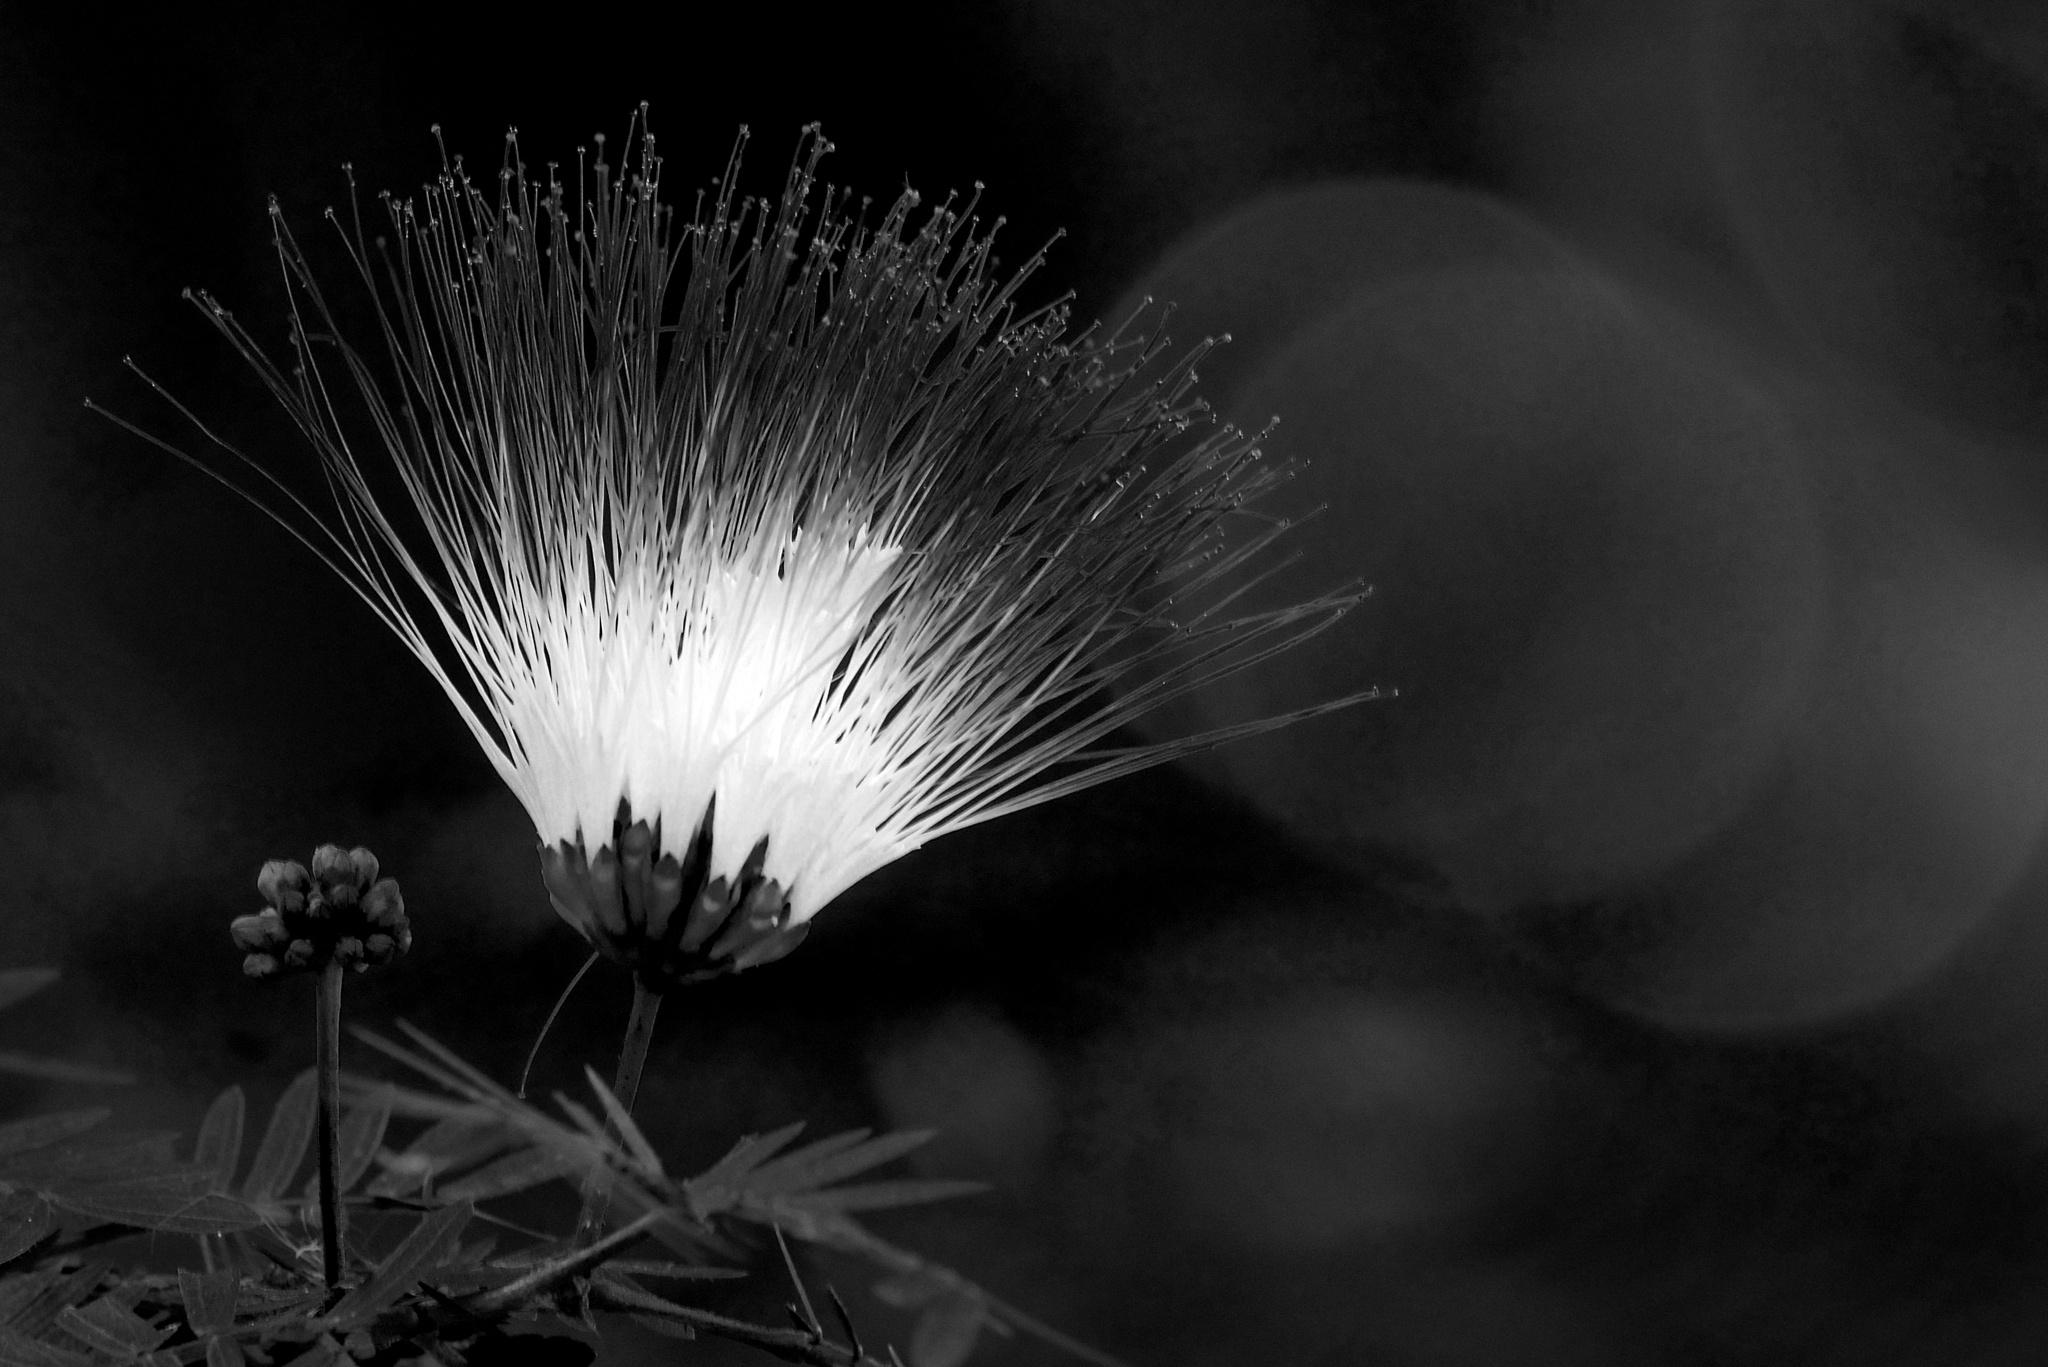 Flash of Light by Steve Aicinena